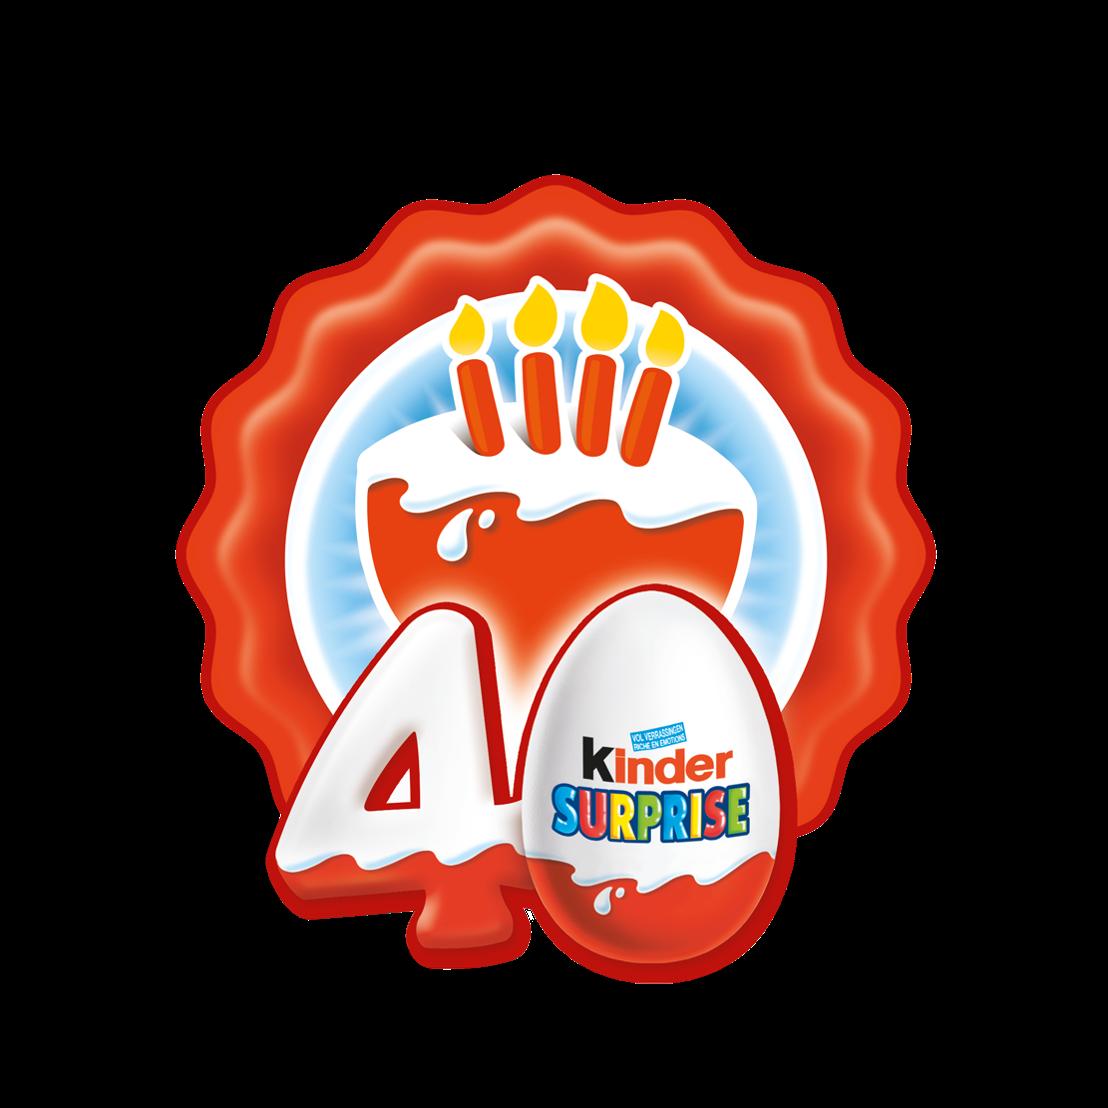 Logo Kinder Surprise 40 jaar